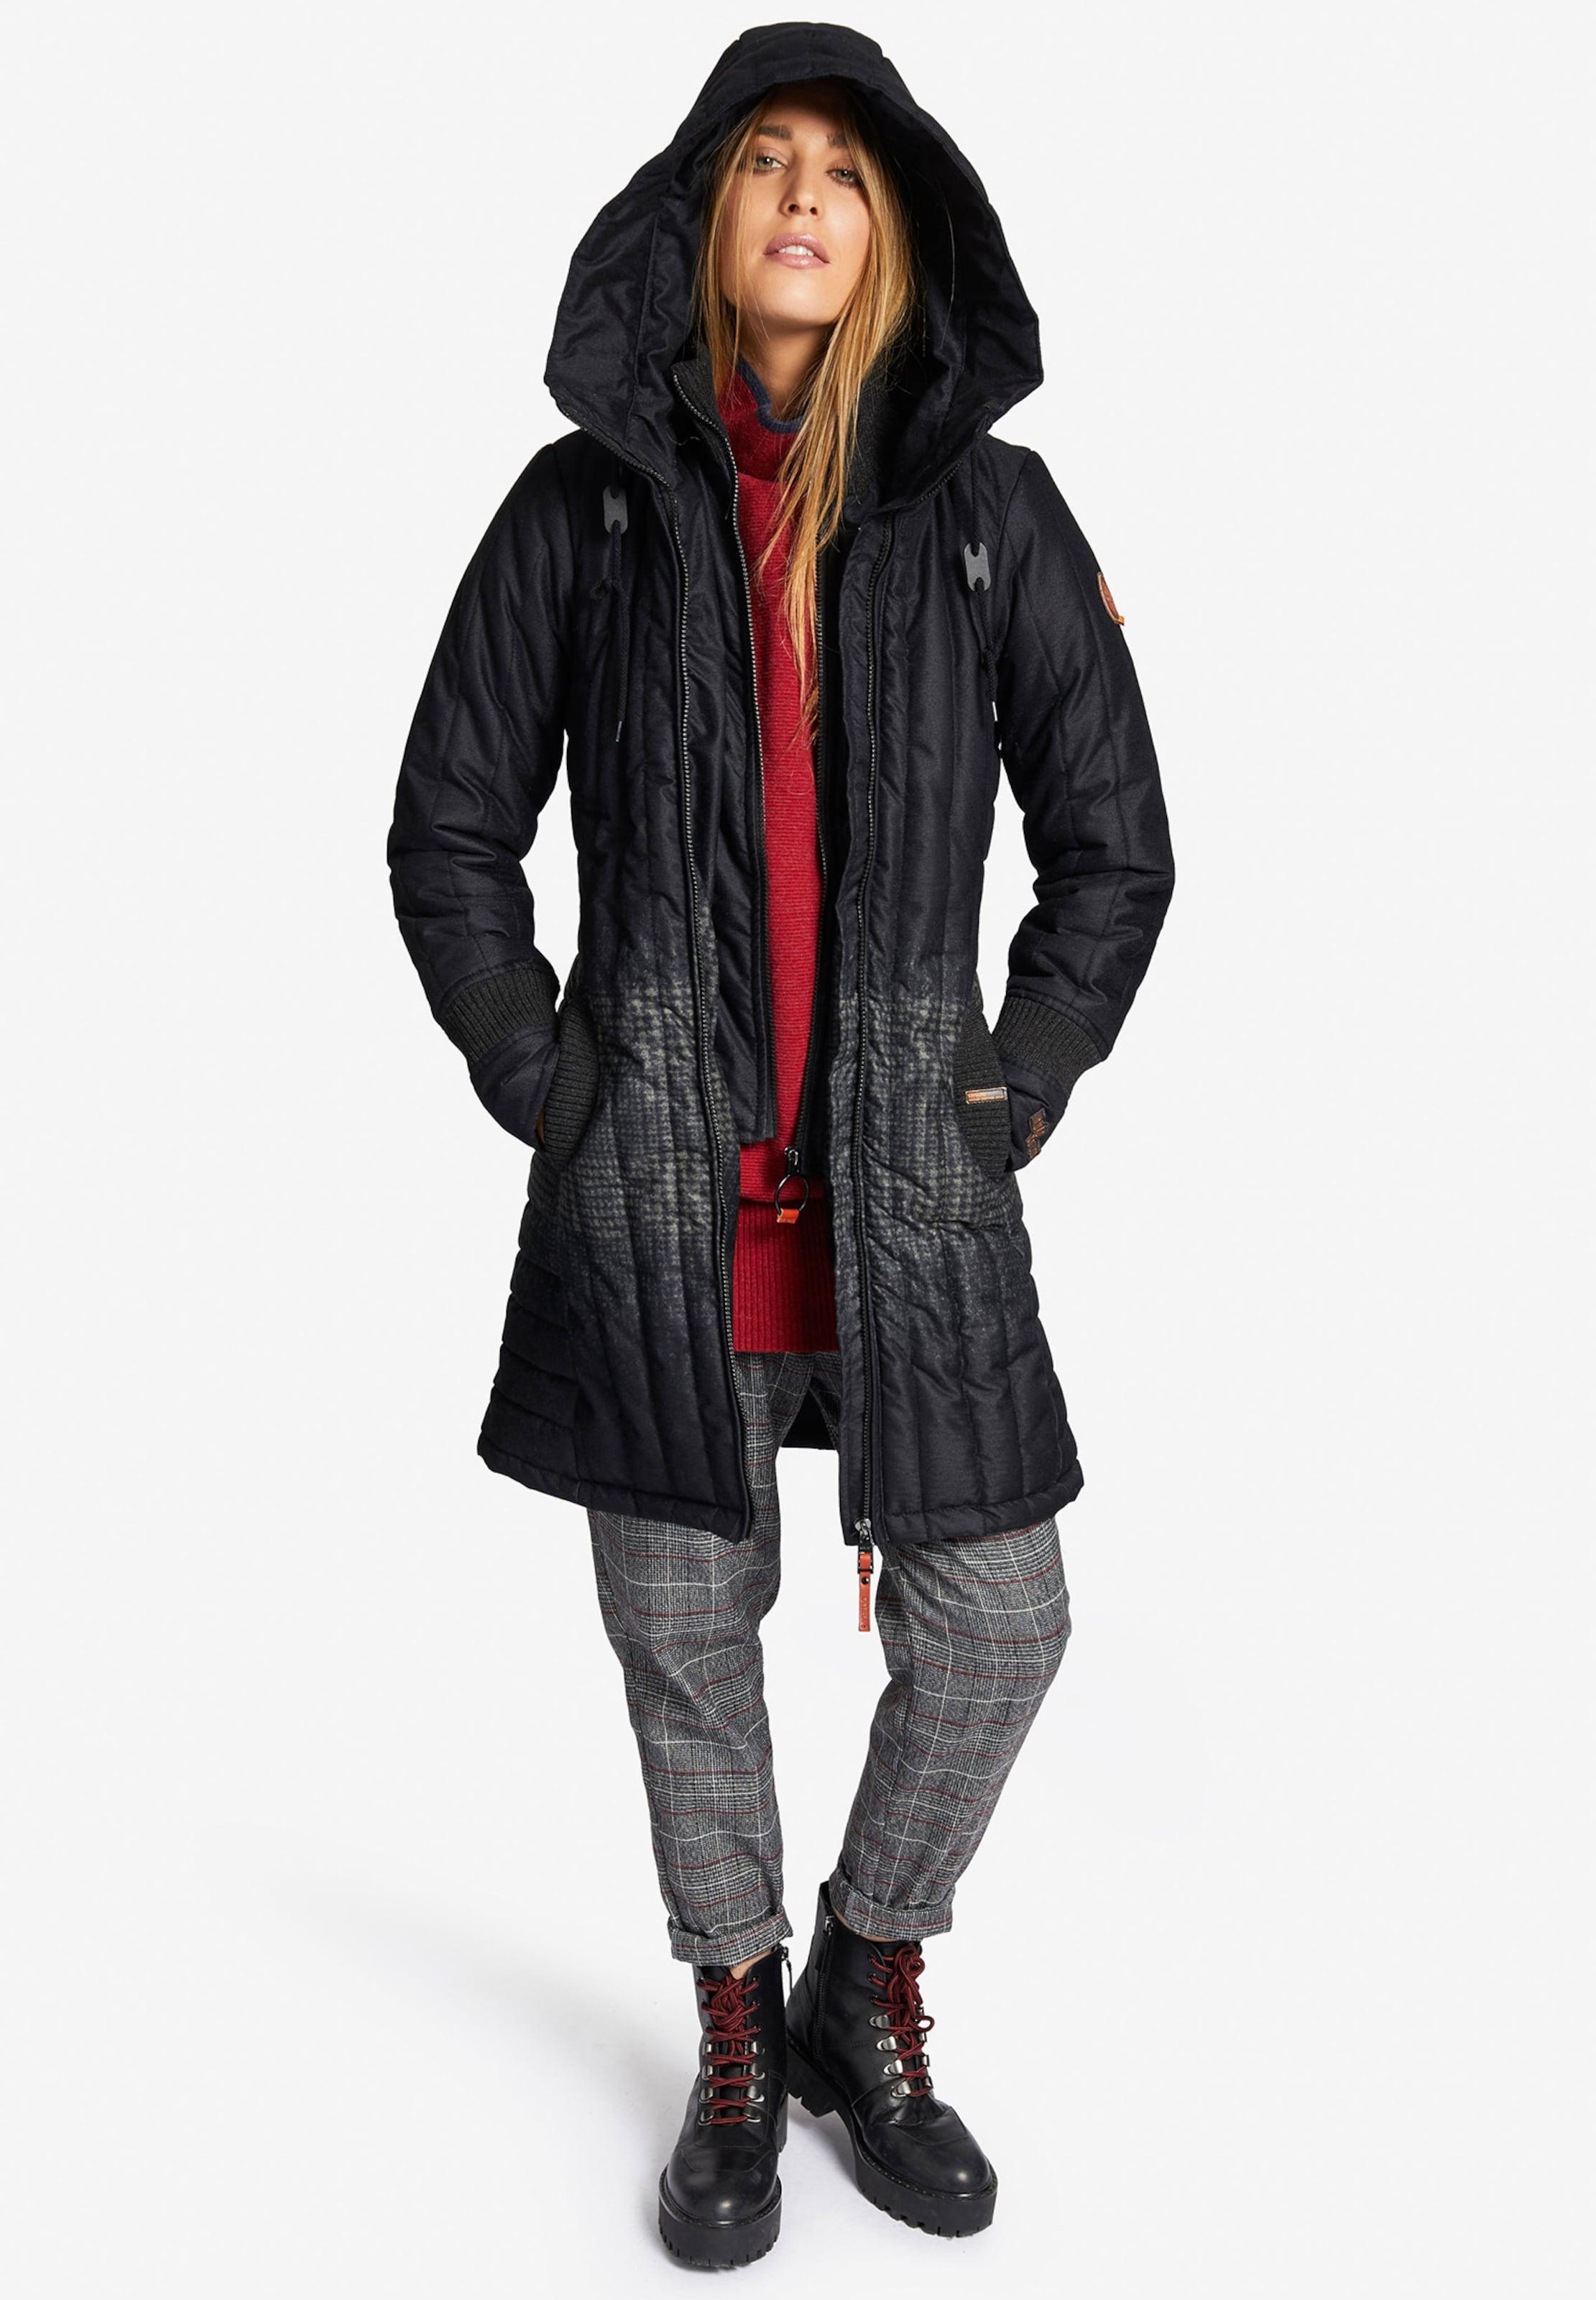 Manteau Bleu En D'hiver NuitNoir Khujo 'jerry Prime2' TlF5uJc3K1